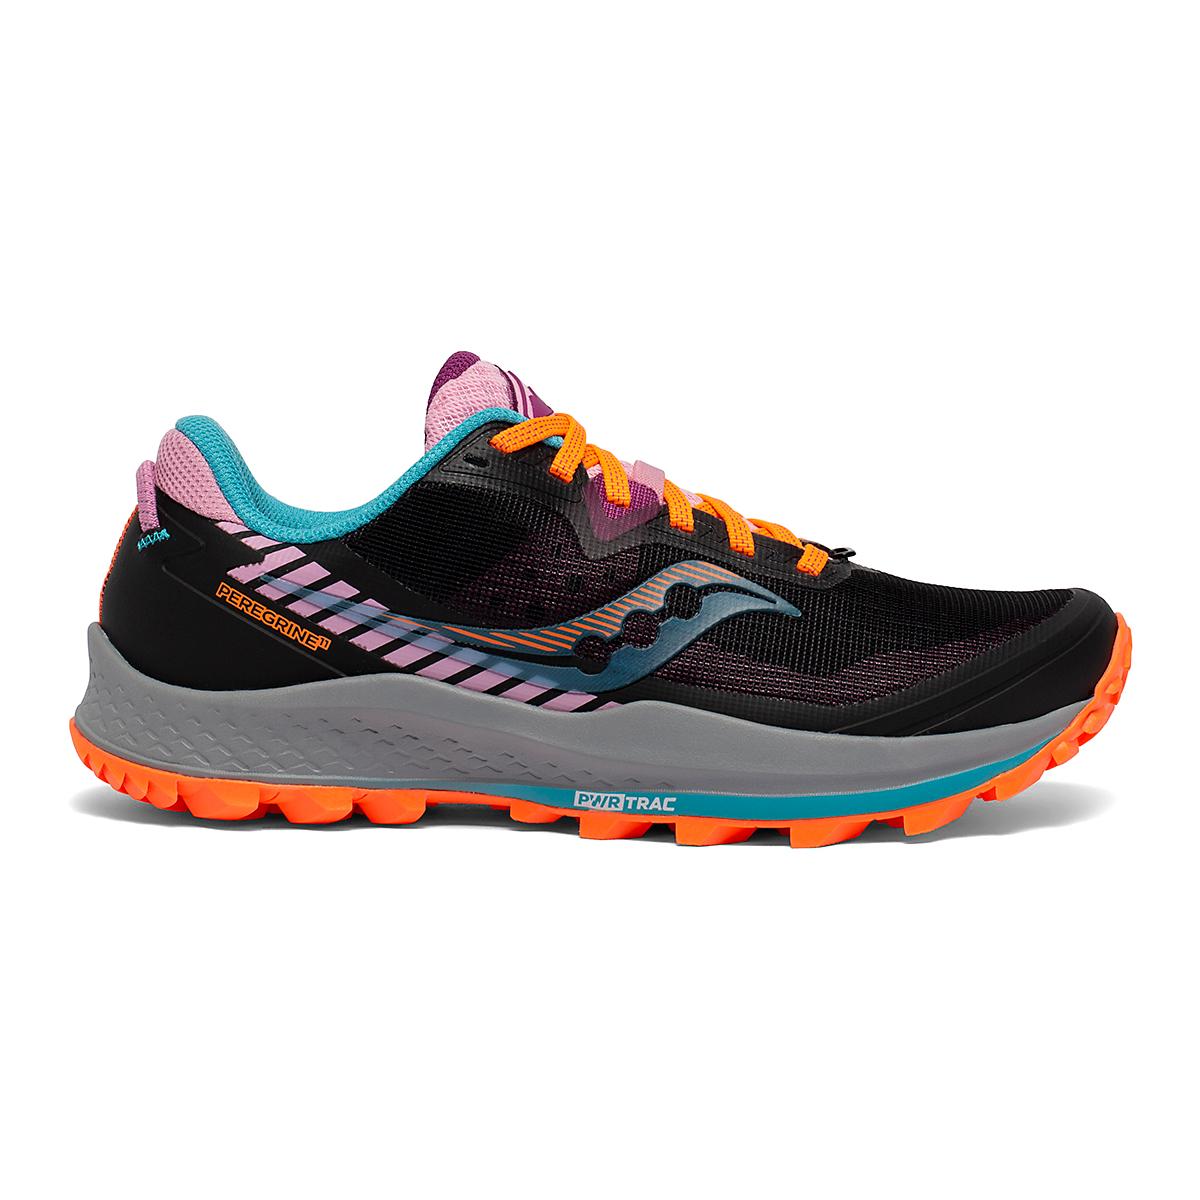 Women's Saucony Peregrine 11 Trail Running Shoe - Color: Future/Black - Size: 5 - Width: Regular, Future/Black, large, image 1